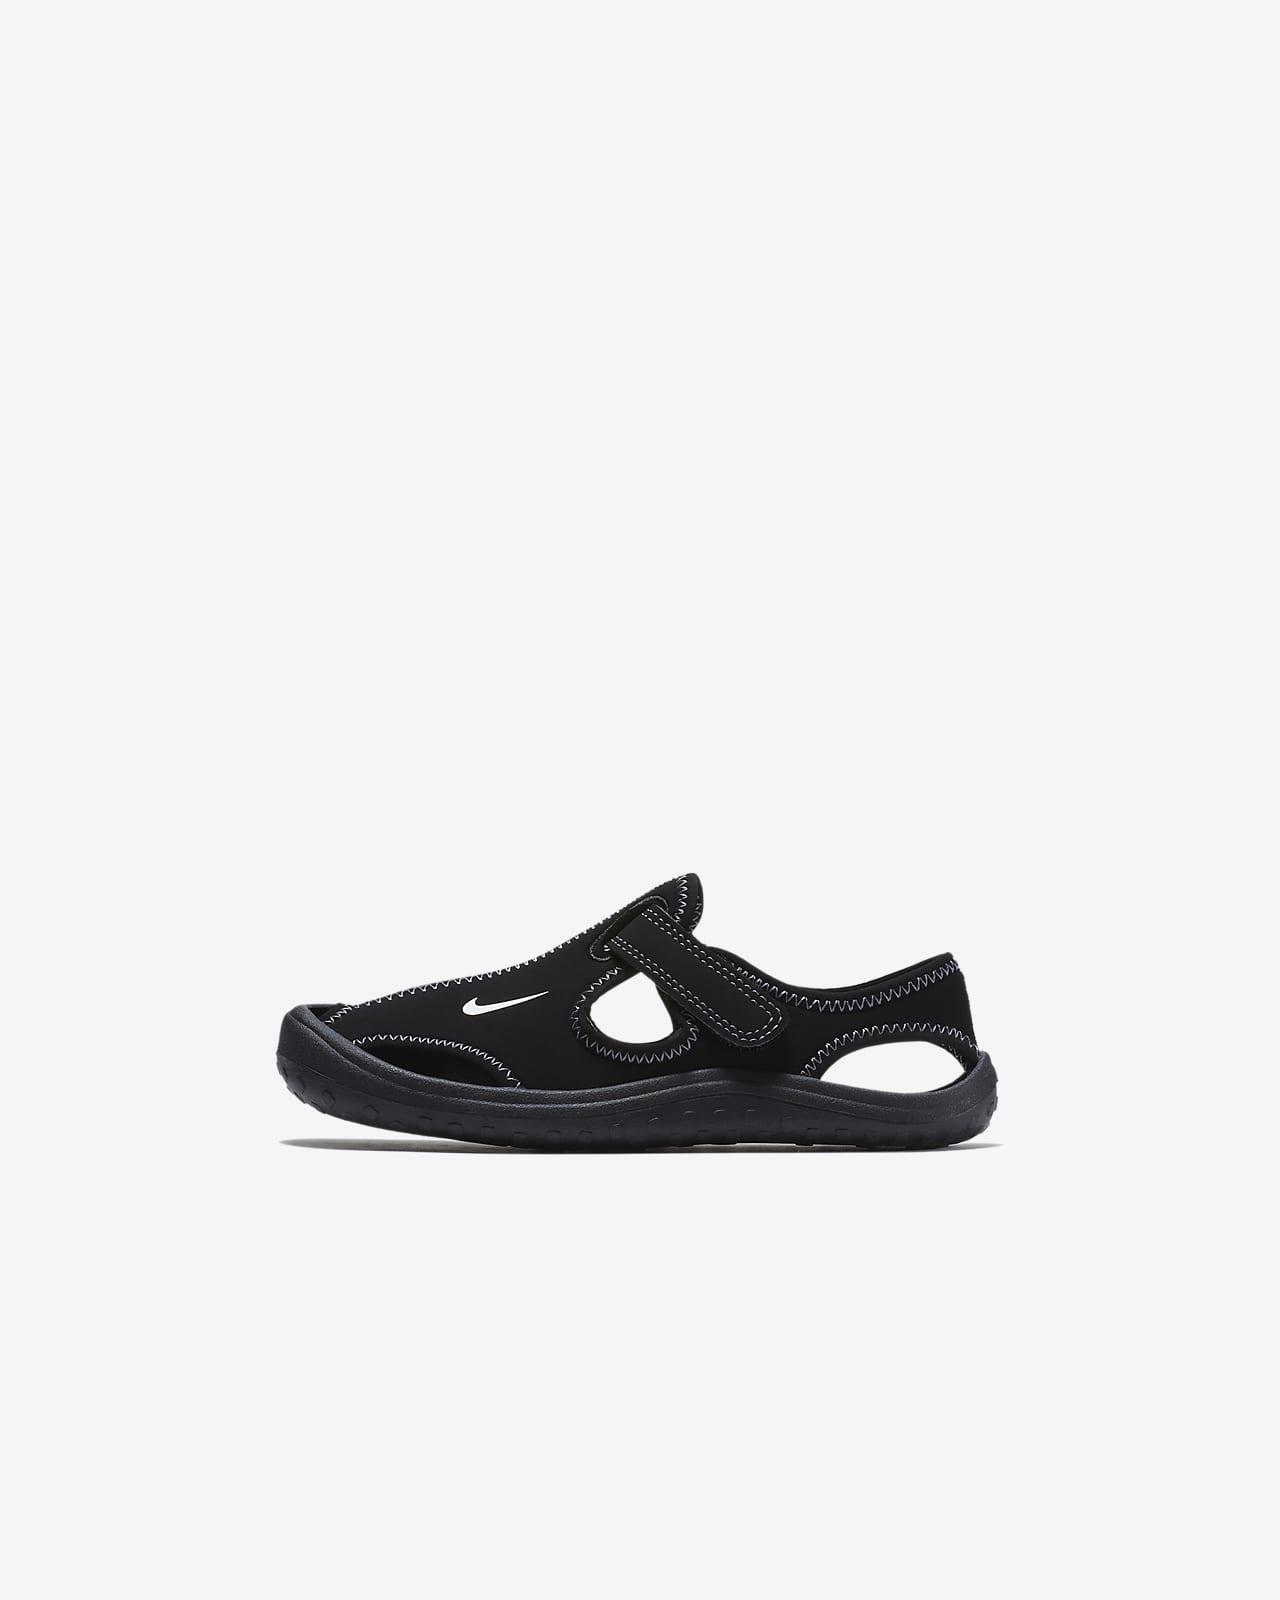 Nike Sunray Protect Sandale für jüngere Kinder